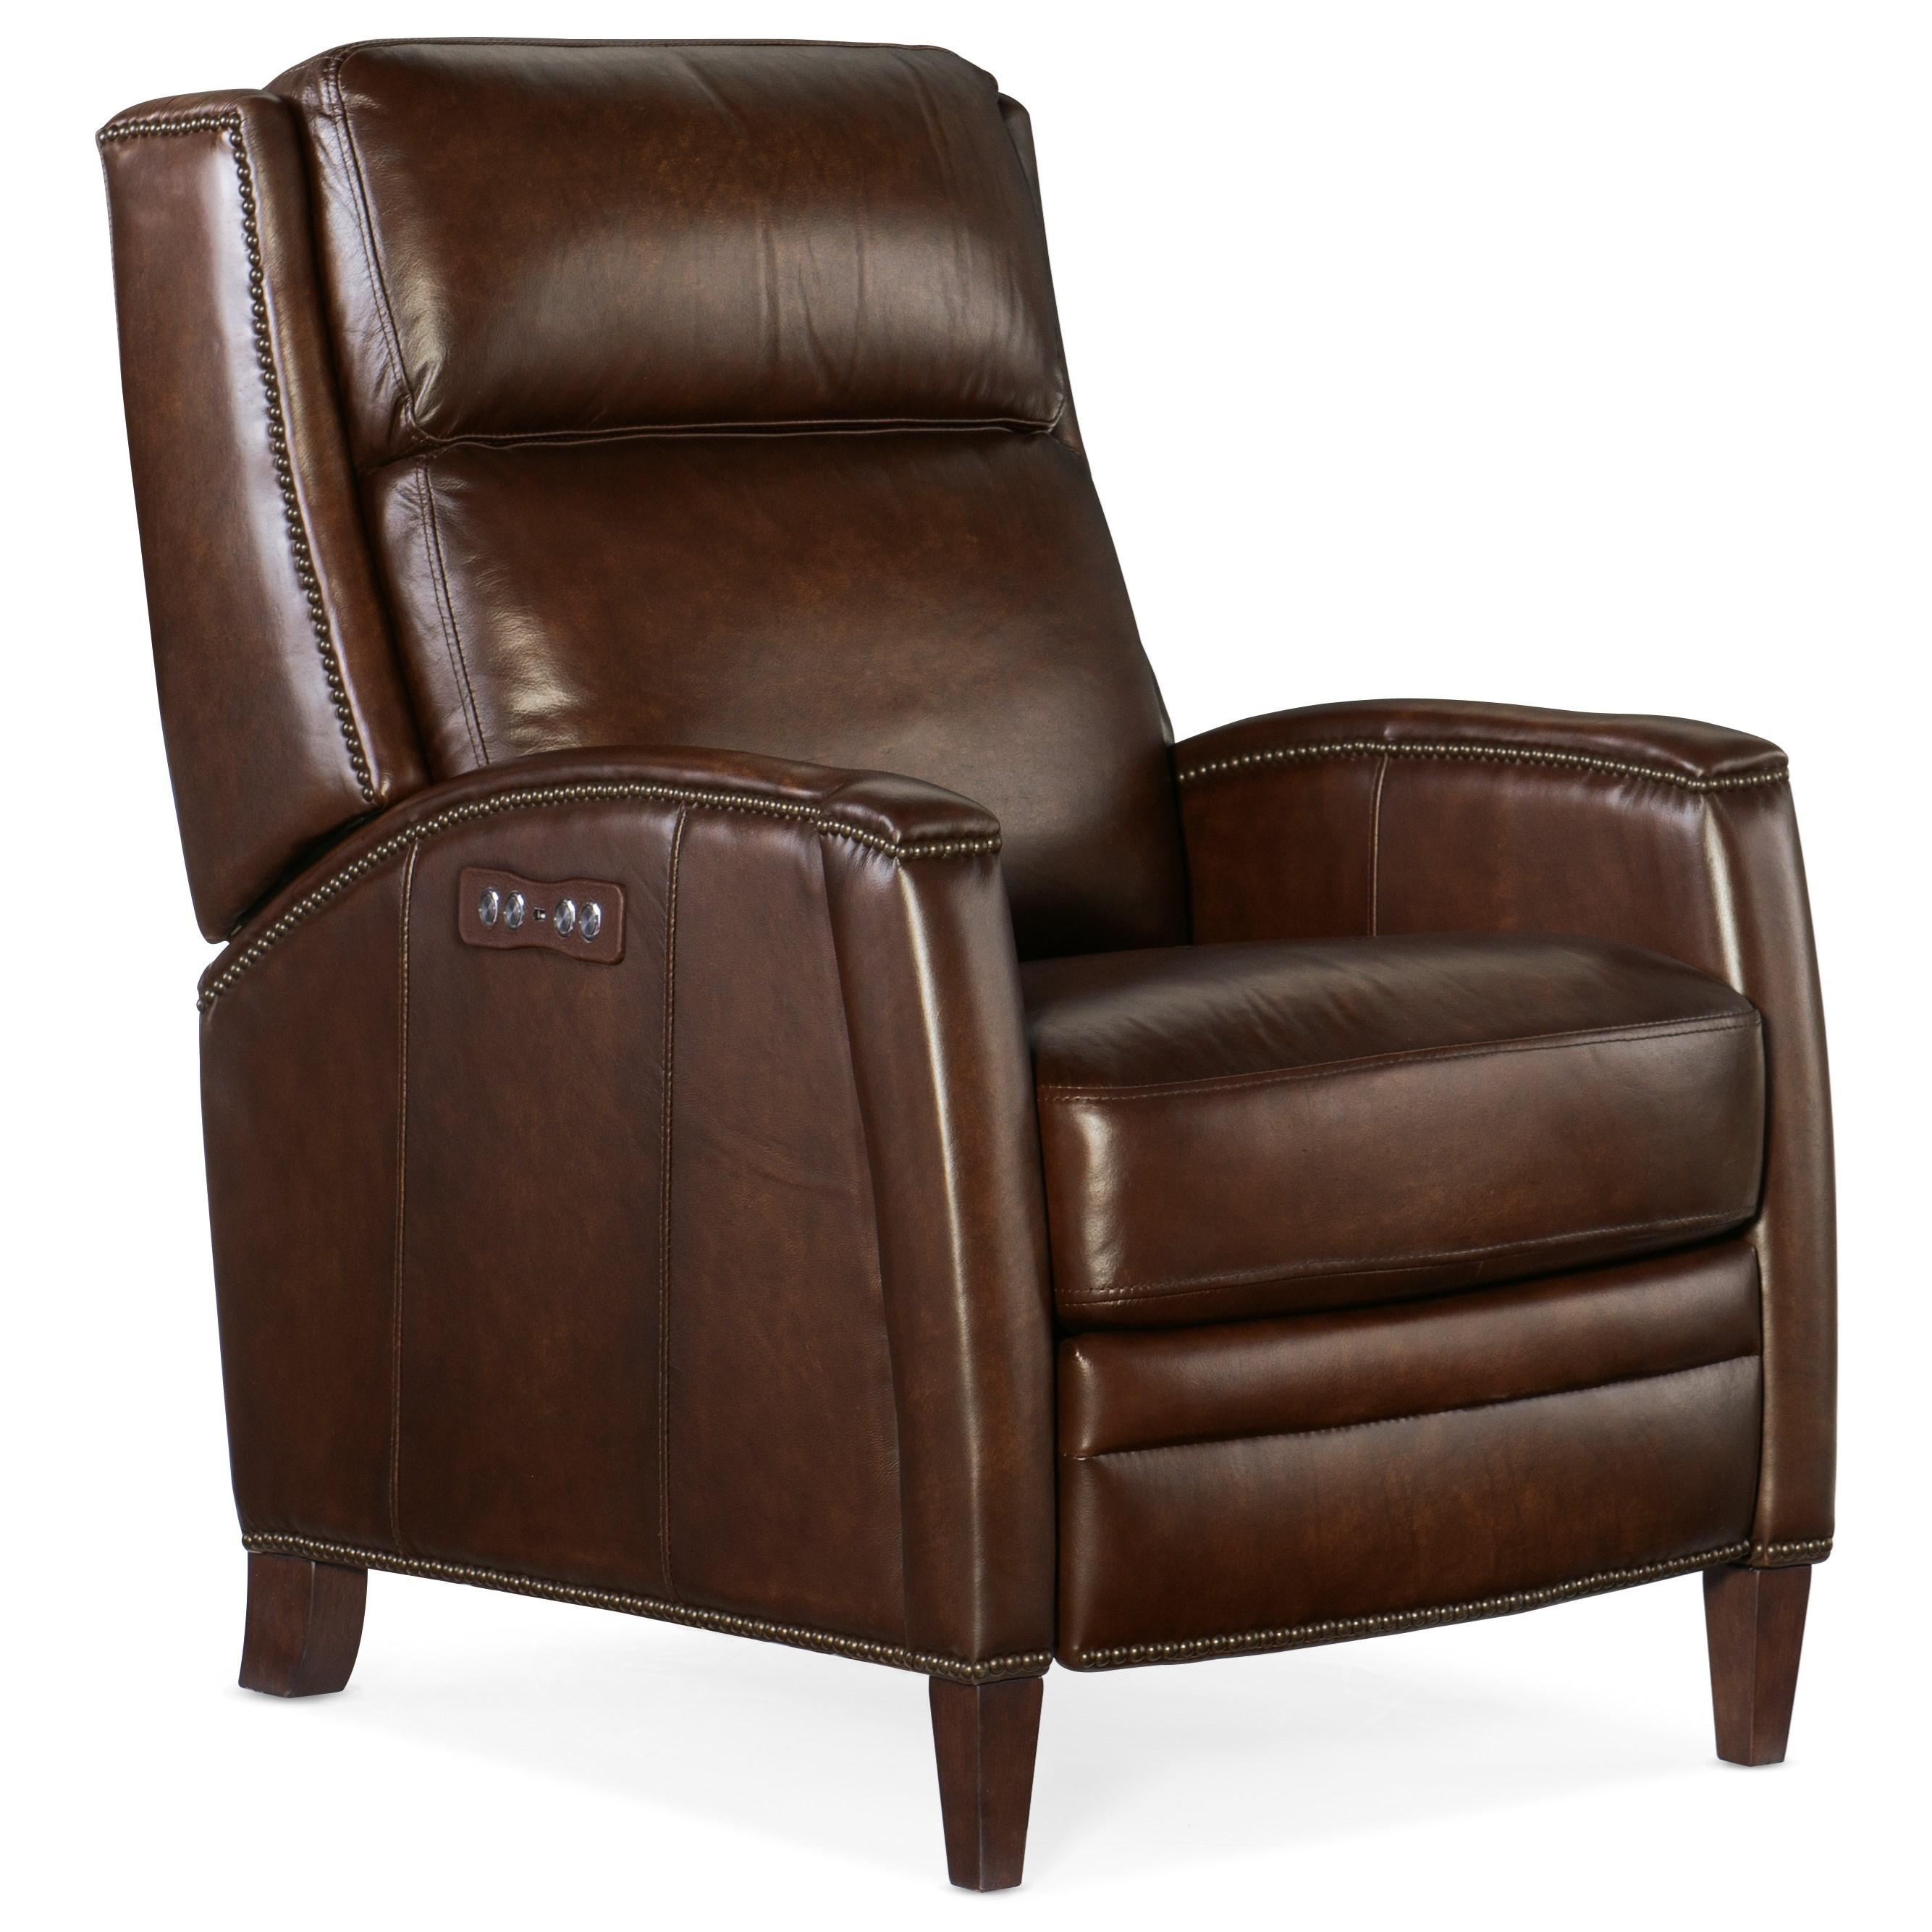 Declan Power Recliner w/ Power Headrest by Hooker Furniture at Johnny Janosik